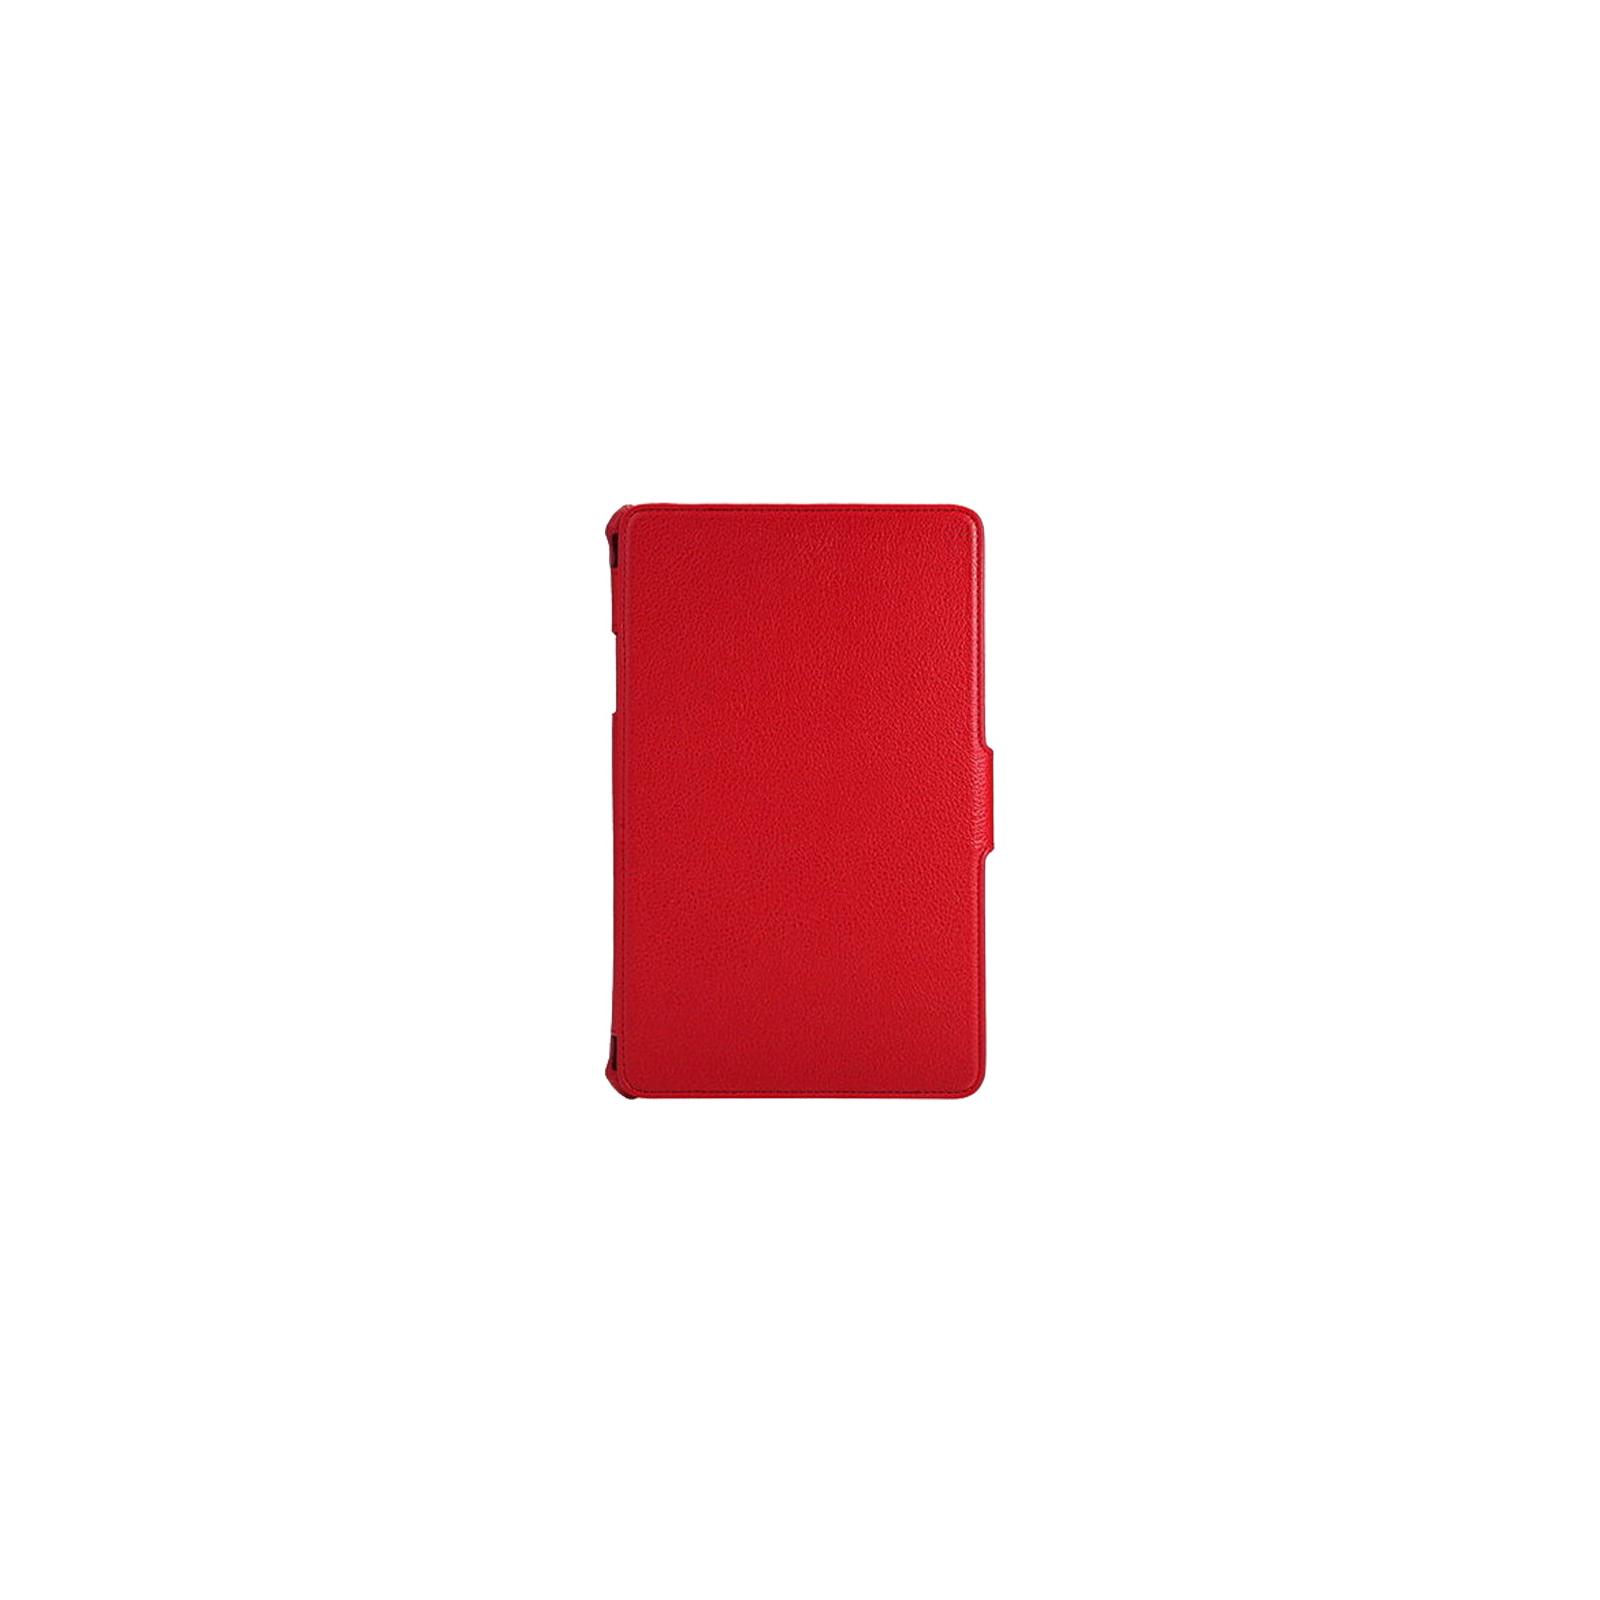 Чехол для планшета AirOn для Samsung Galaxy Tab E 9.6 red (4822352777258)